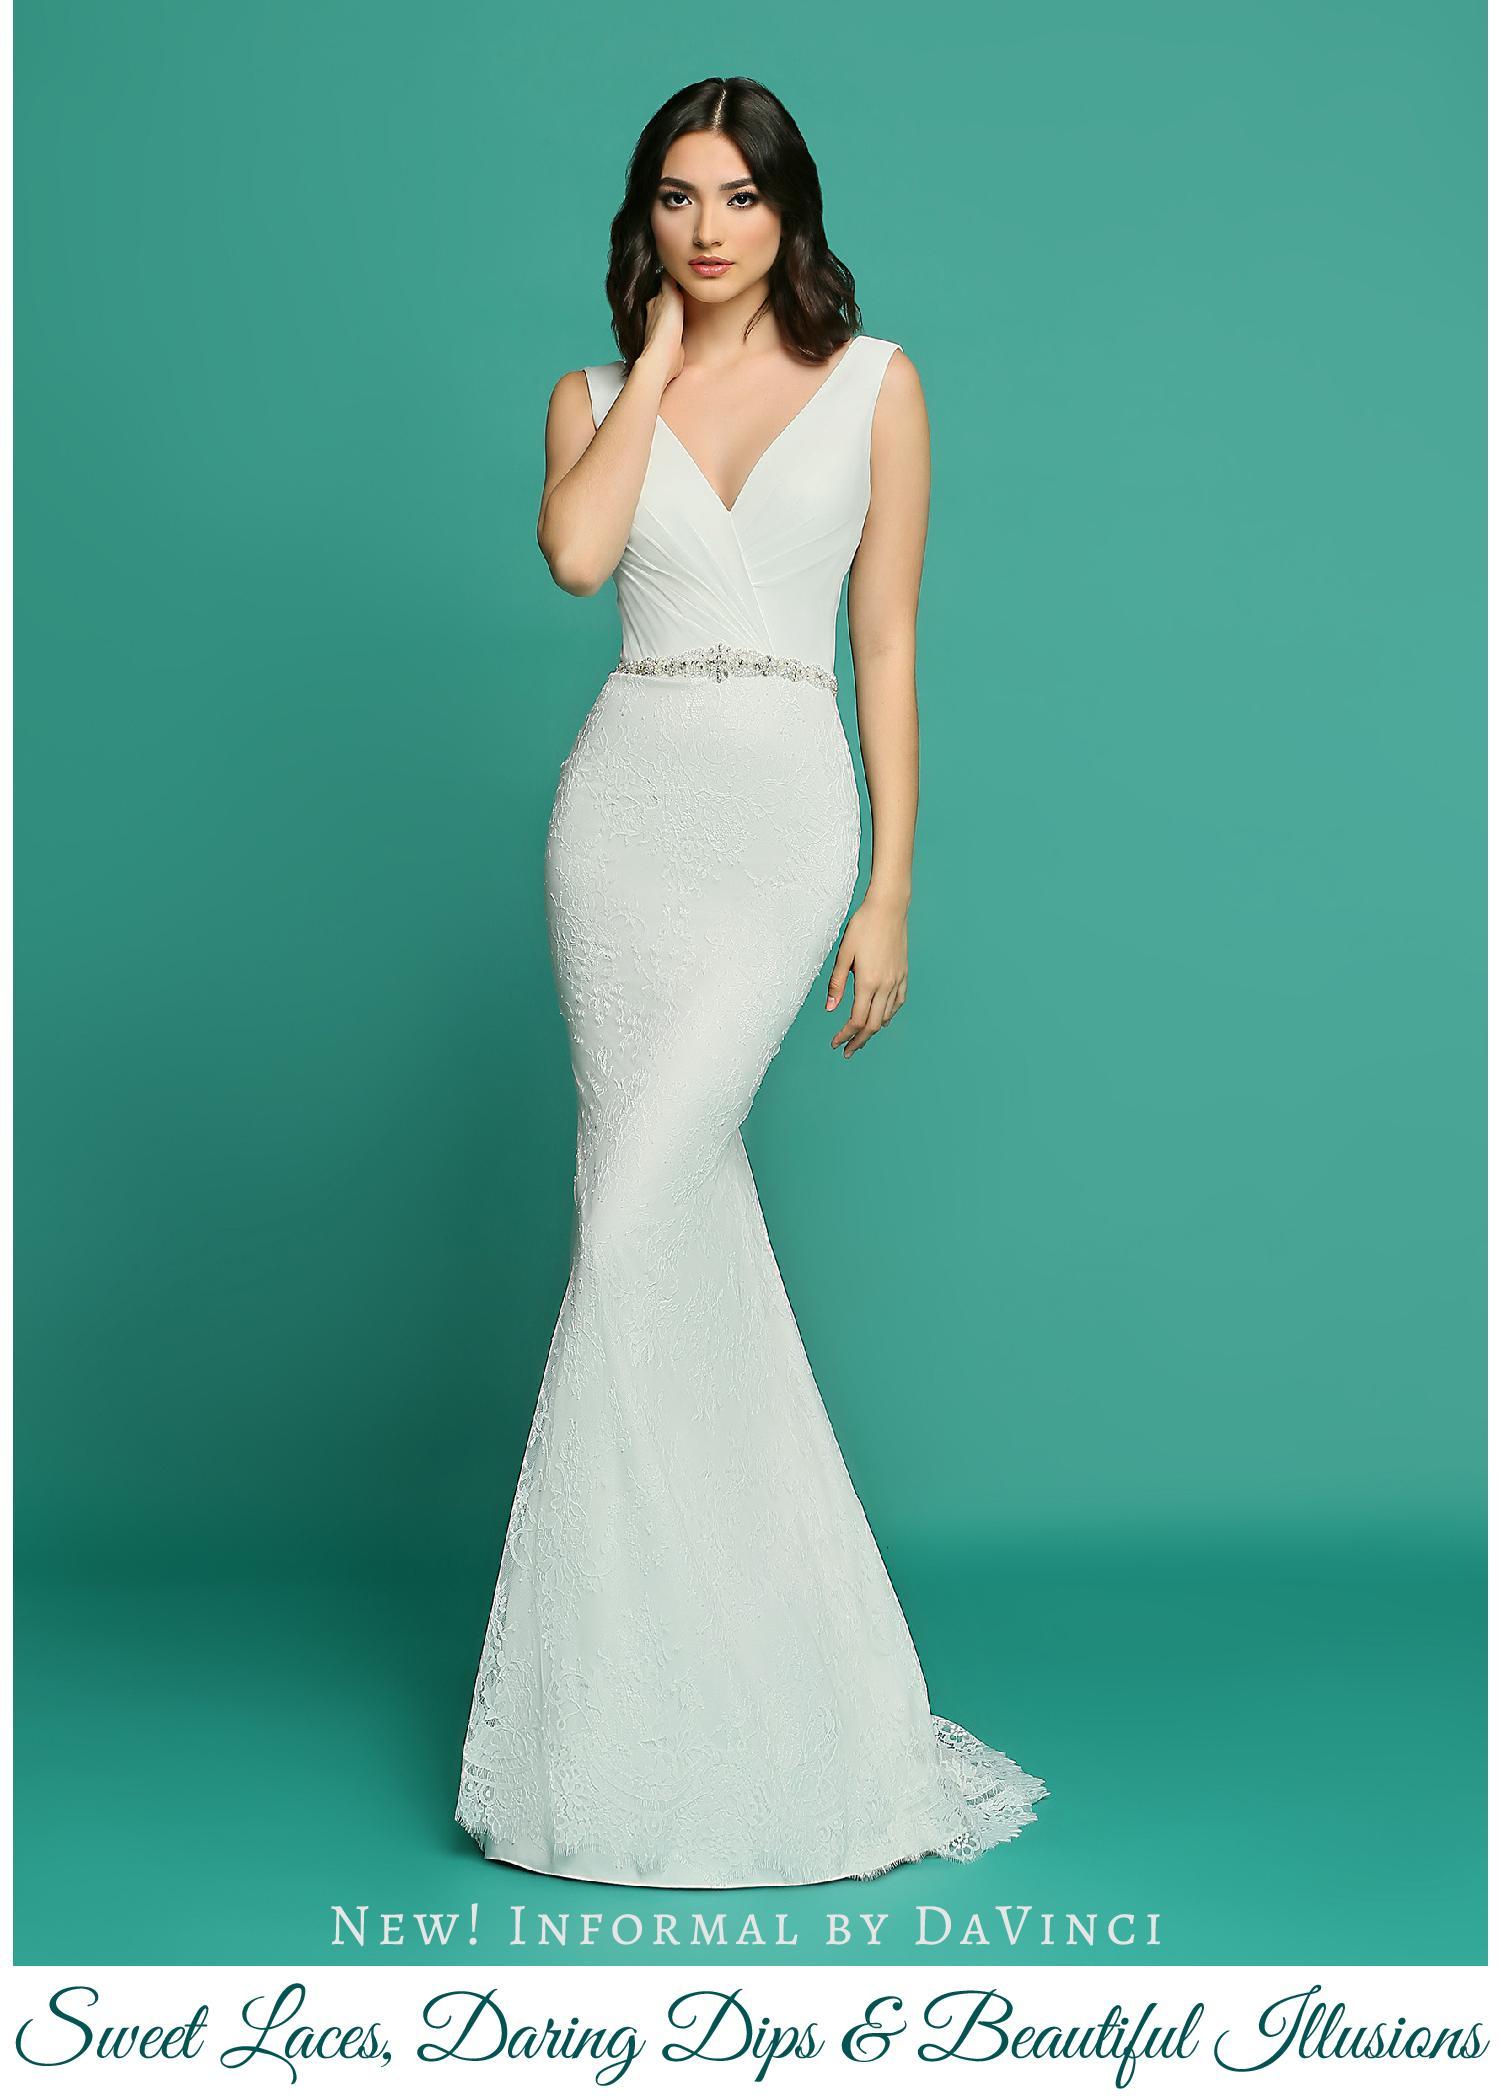 536749847028d Wedding Dresses from Informal by DaVinci: Sweet Laces, Daring Dips &  Beautiful Illusions – DaVinci Bridal Blog